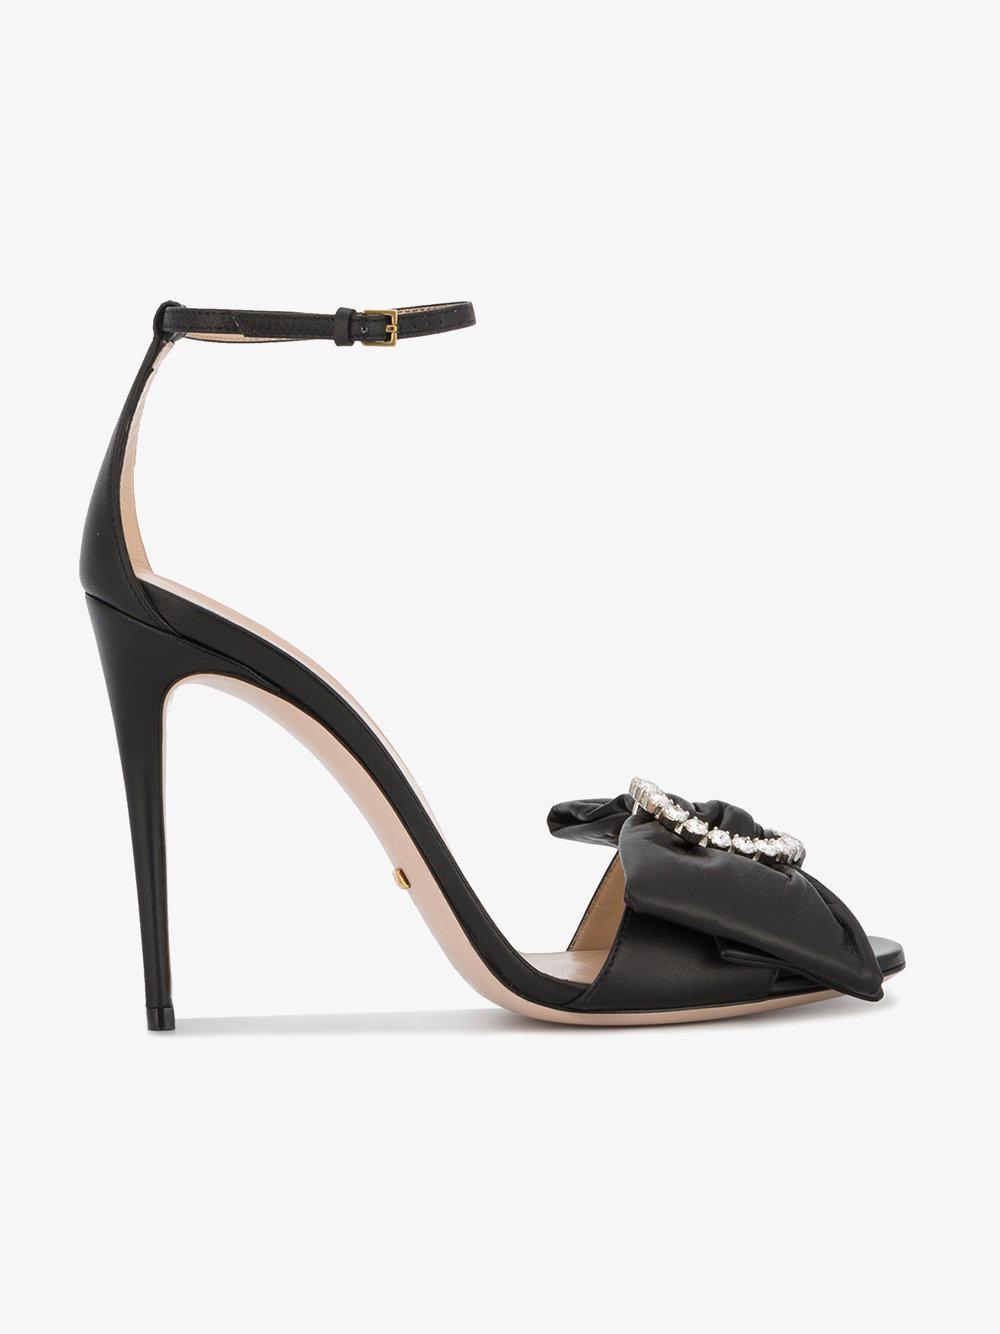 9c3c01d8f33d Gucci Black Leather Ilse Bow 115 Sandals in Black - Lyst